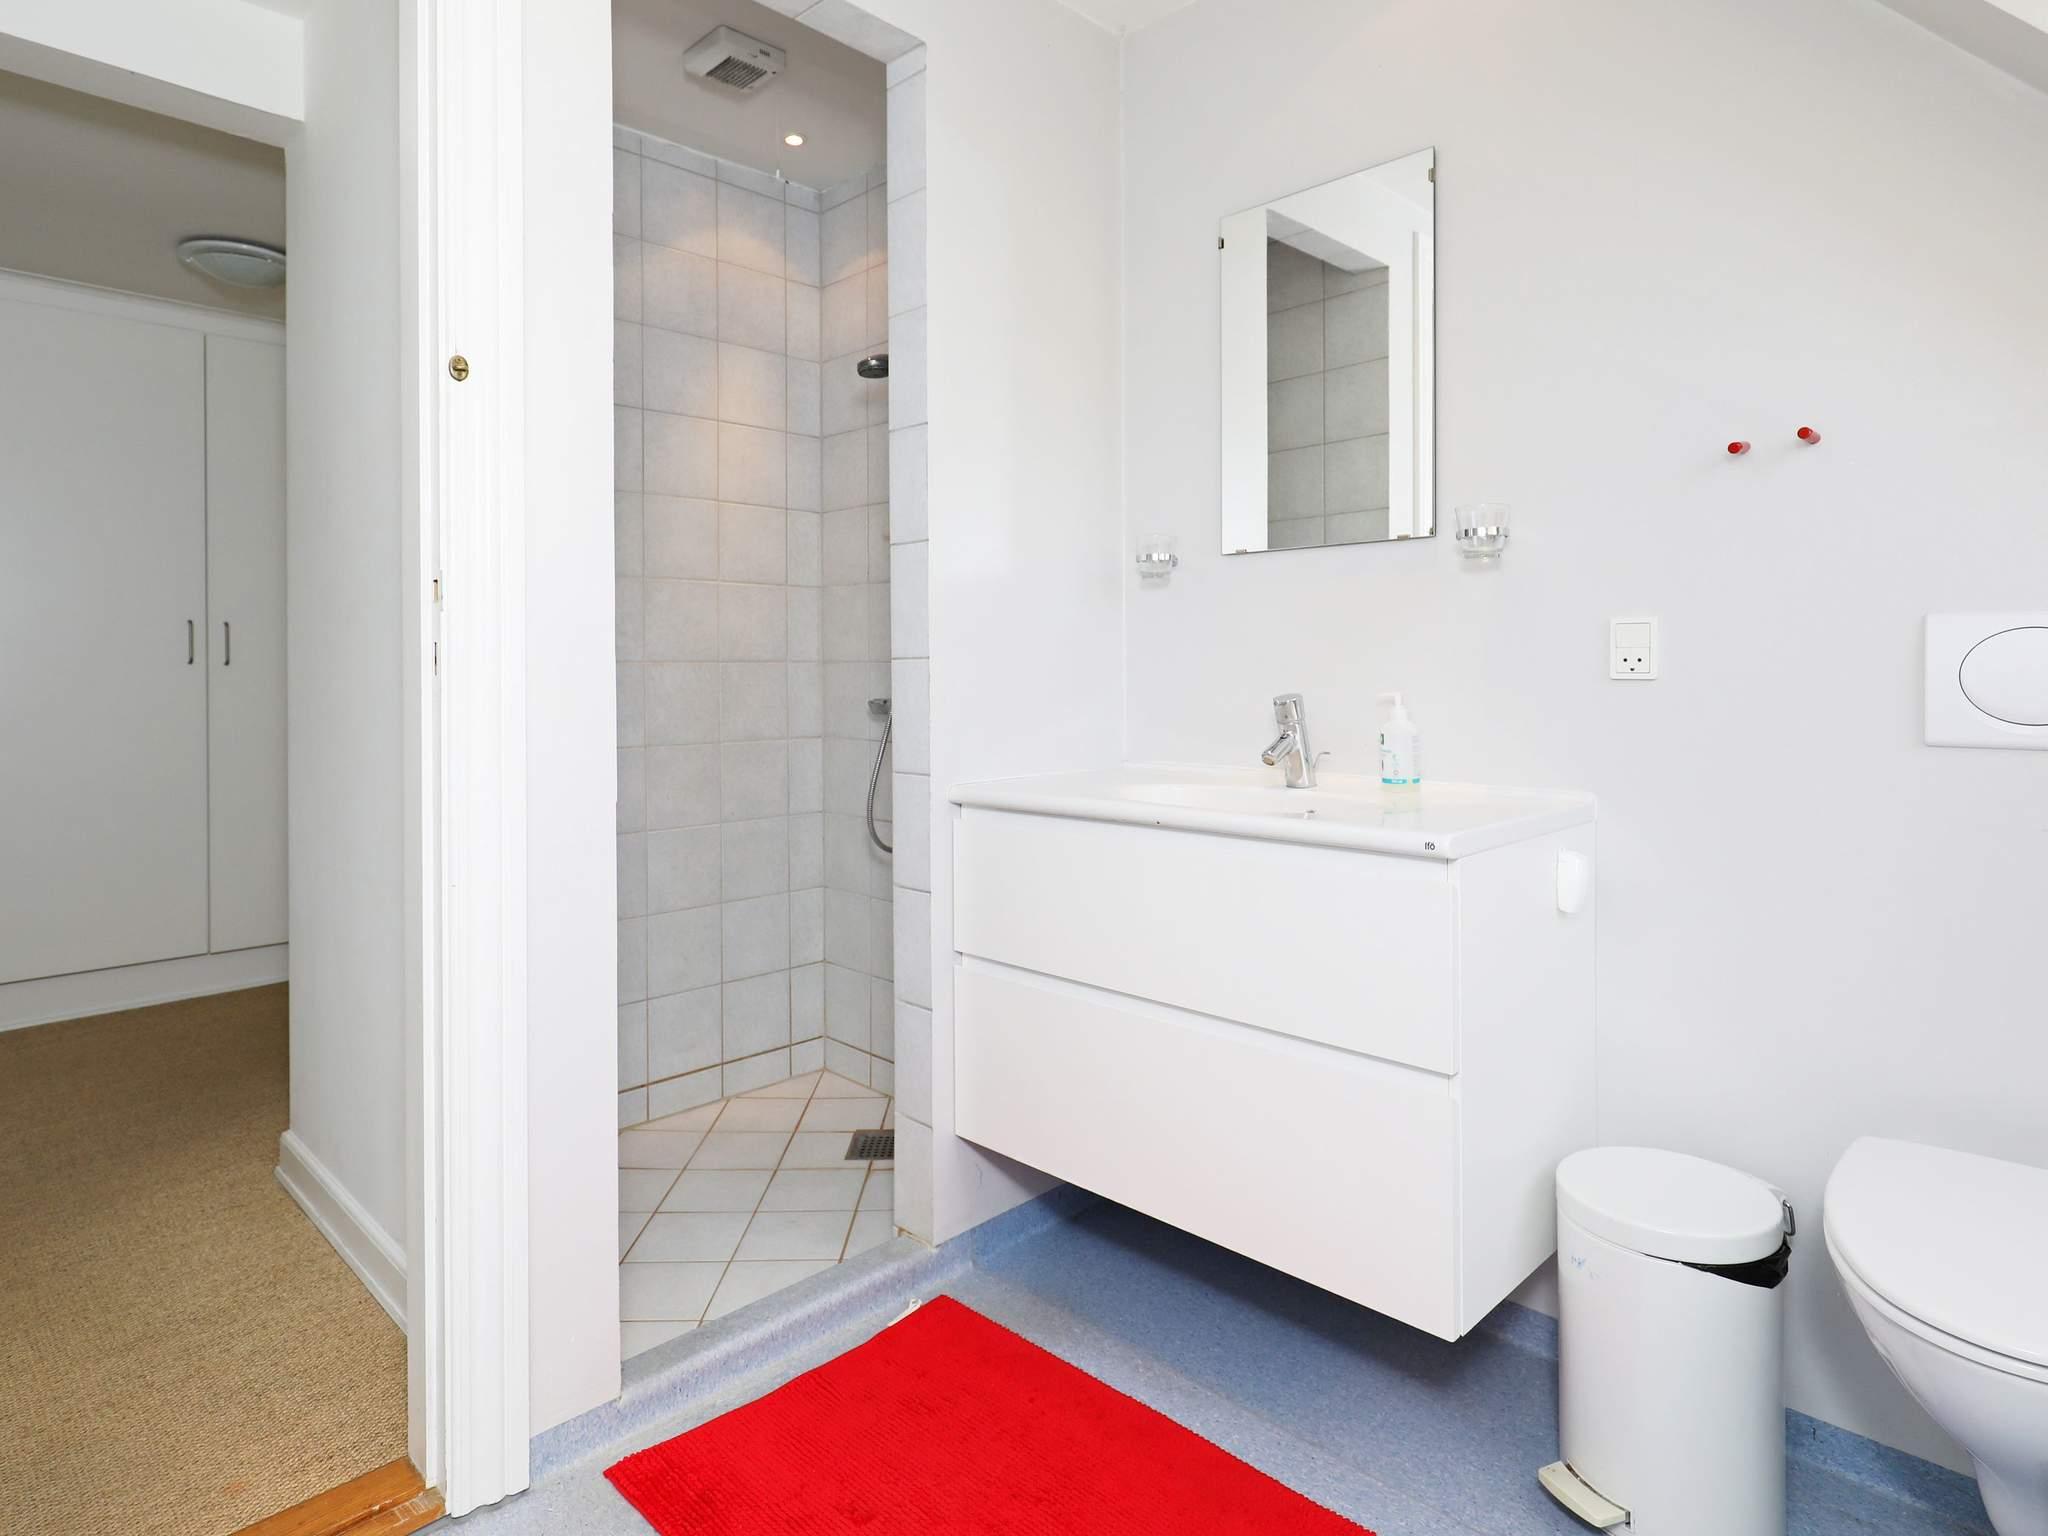 Ferienhaus Bukkemose (2453155), Humble, , Langeland, Dänemark, Bild 20